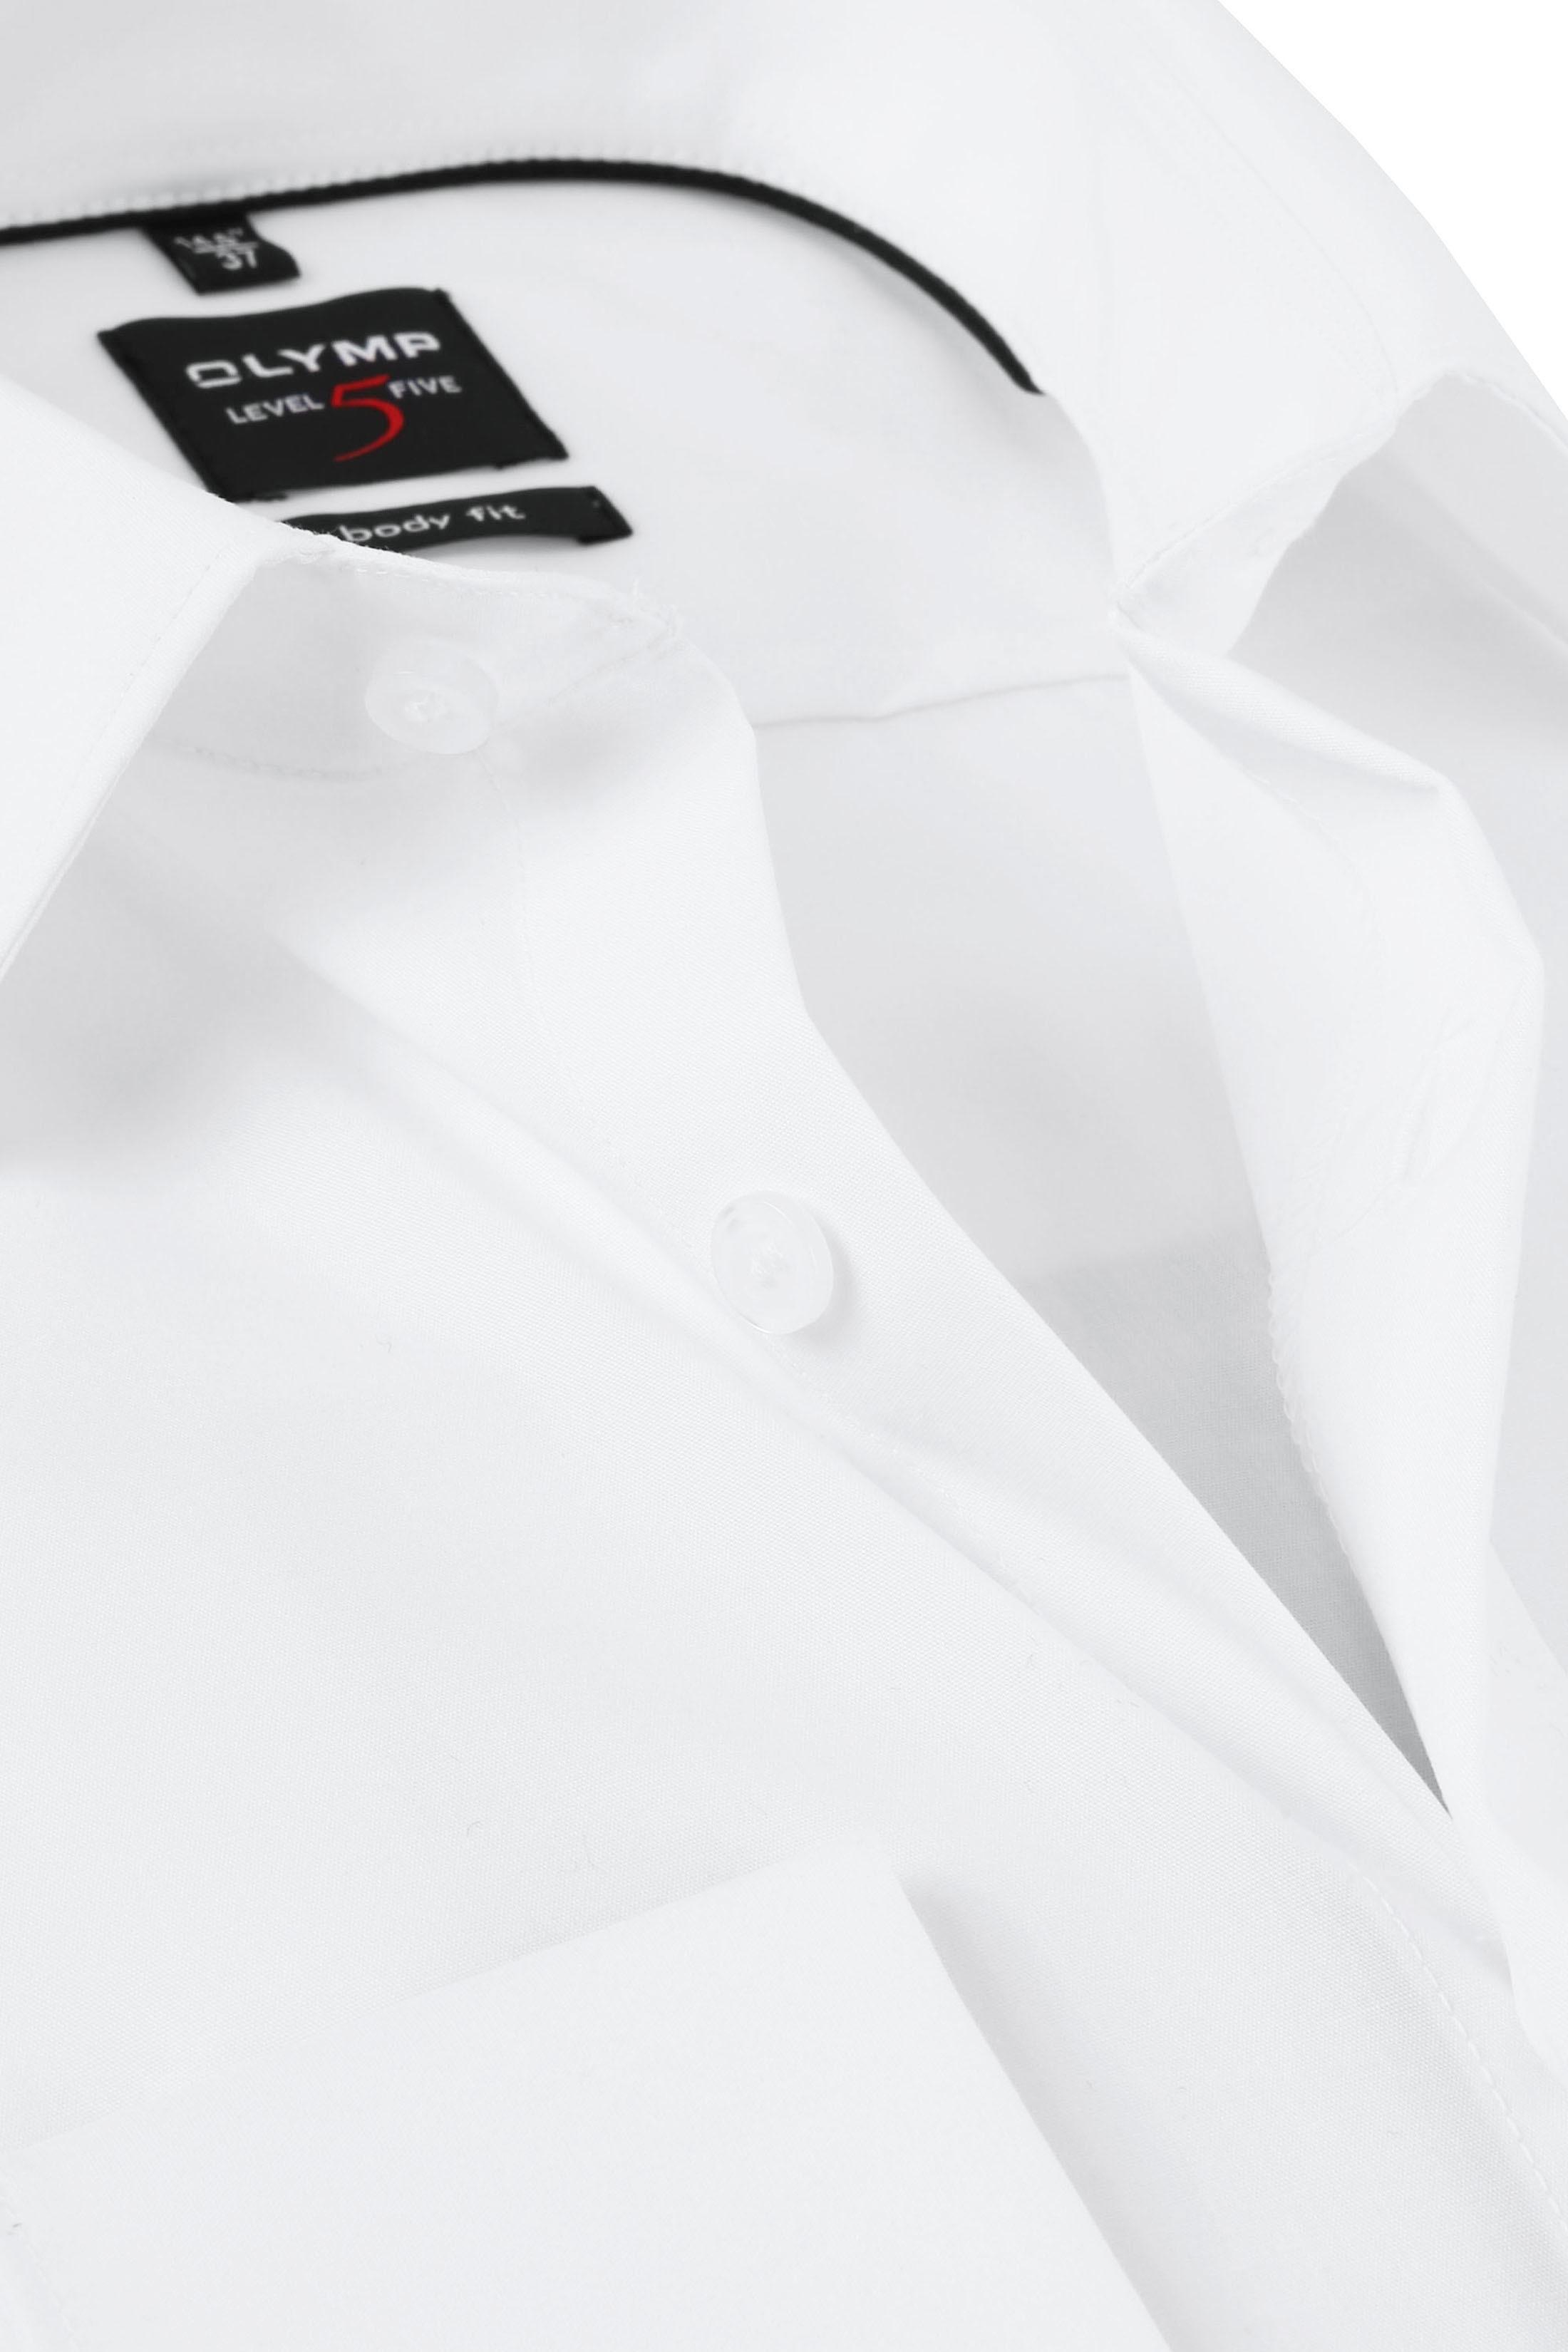 OLYMP Smoking Overhemd Level 5 Wit